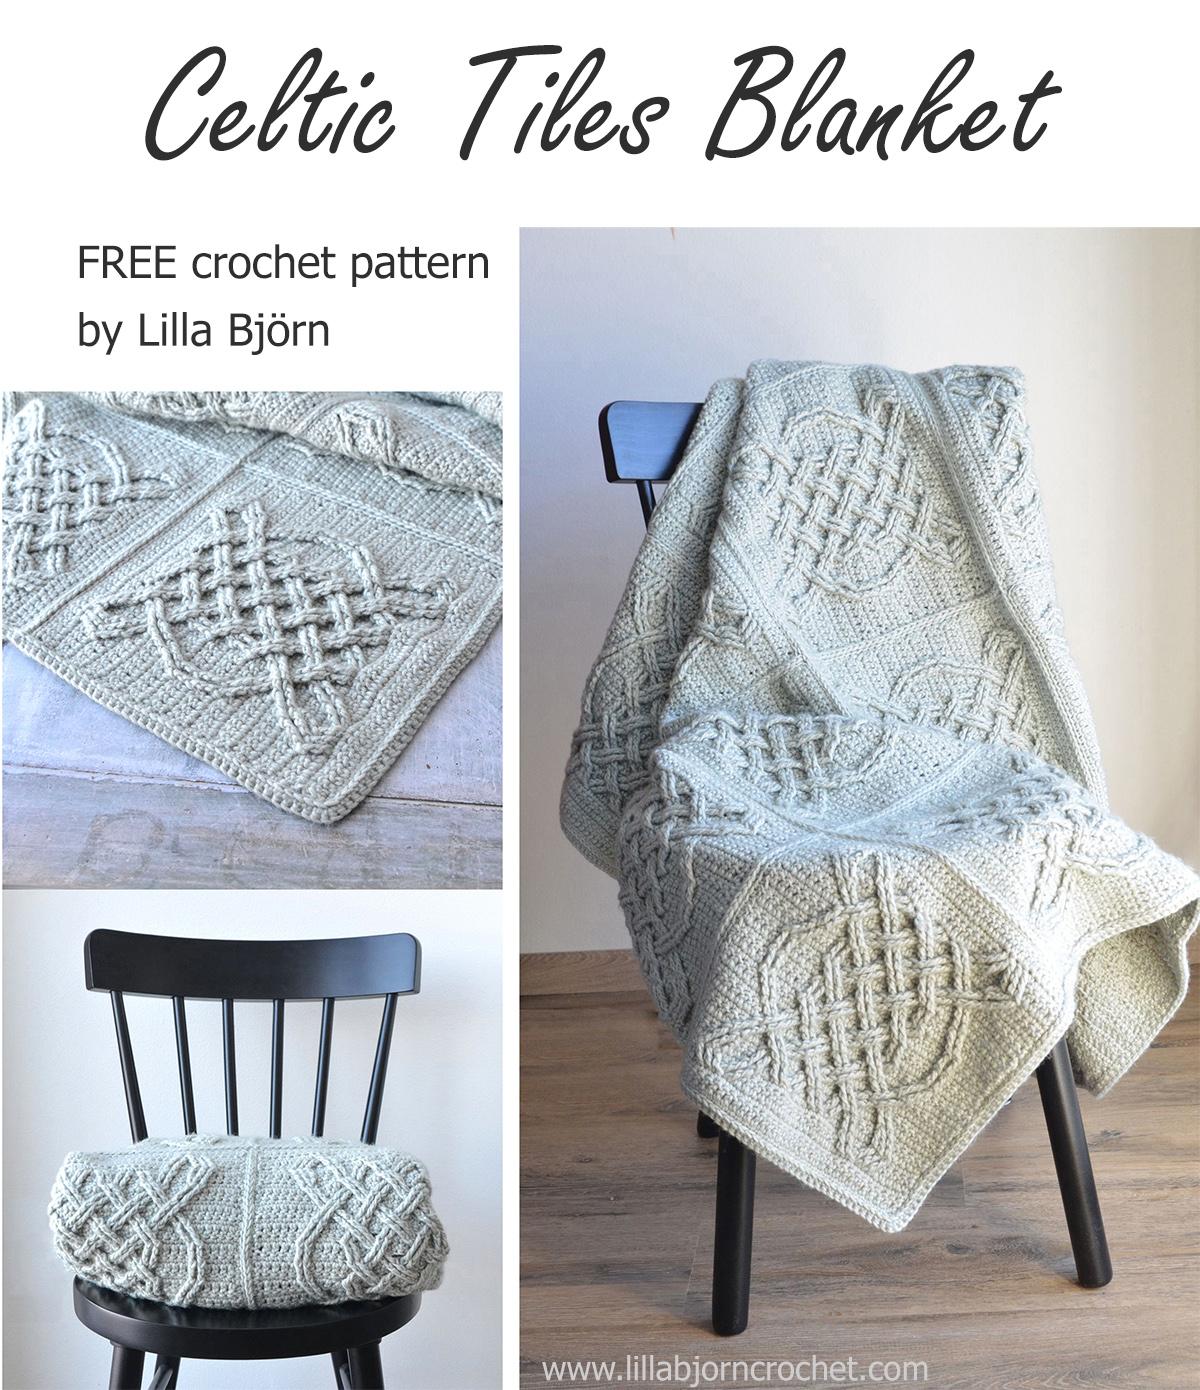 Crochet Patterns Free Celtic Tiles Blanket Free Overlay Crochet Pattern Lillabjrns